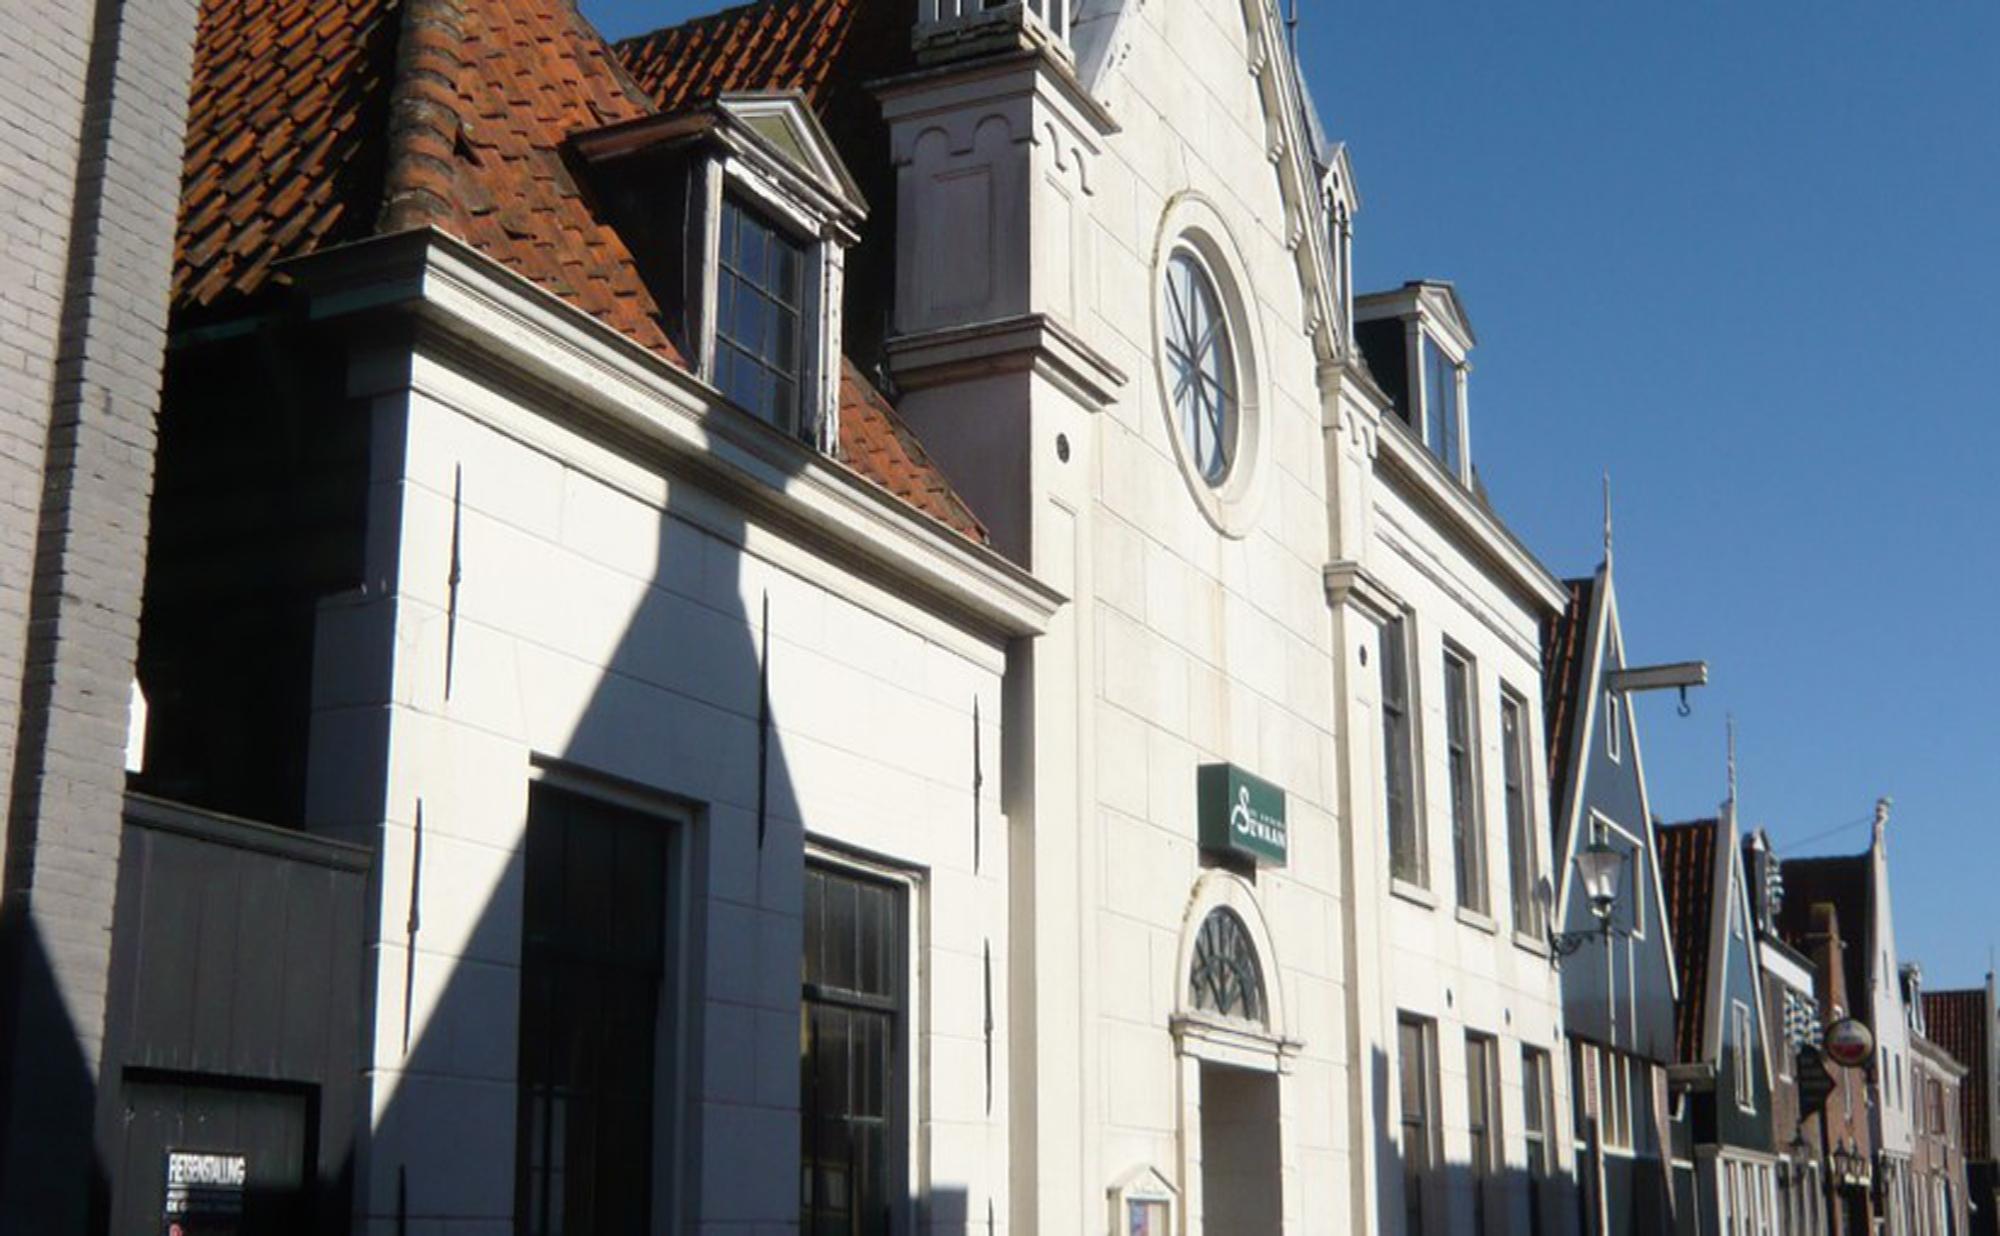 De Wilde Stad draait in De Groene Zwaan. (Foto: De Groene Zwaan)